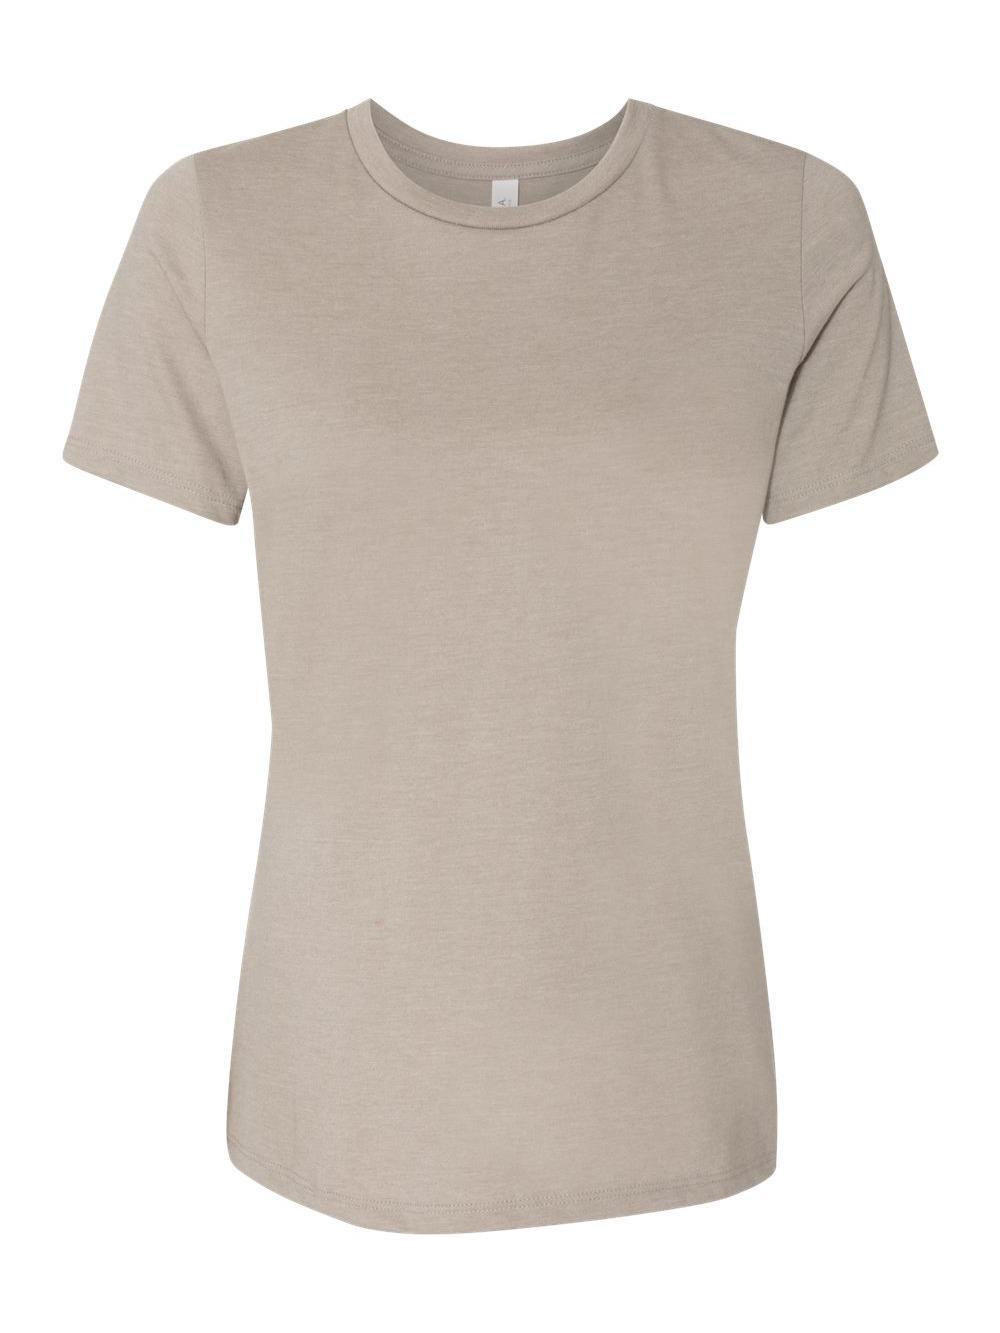 Bella-Canvas-Women-039-s-Relaxed-Short-Sleeve-Jersey-Tee-6400 thumbnail 42